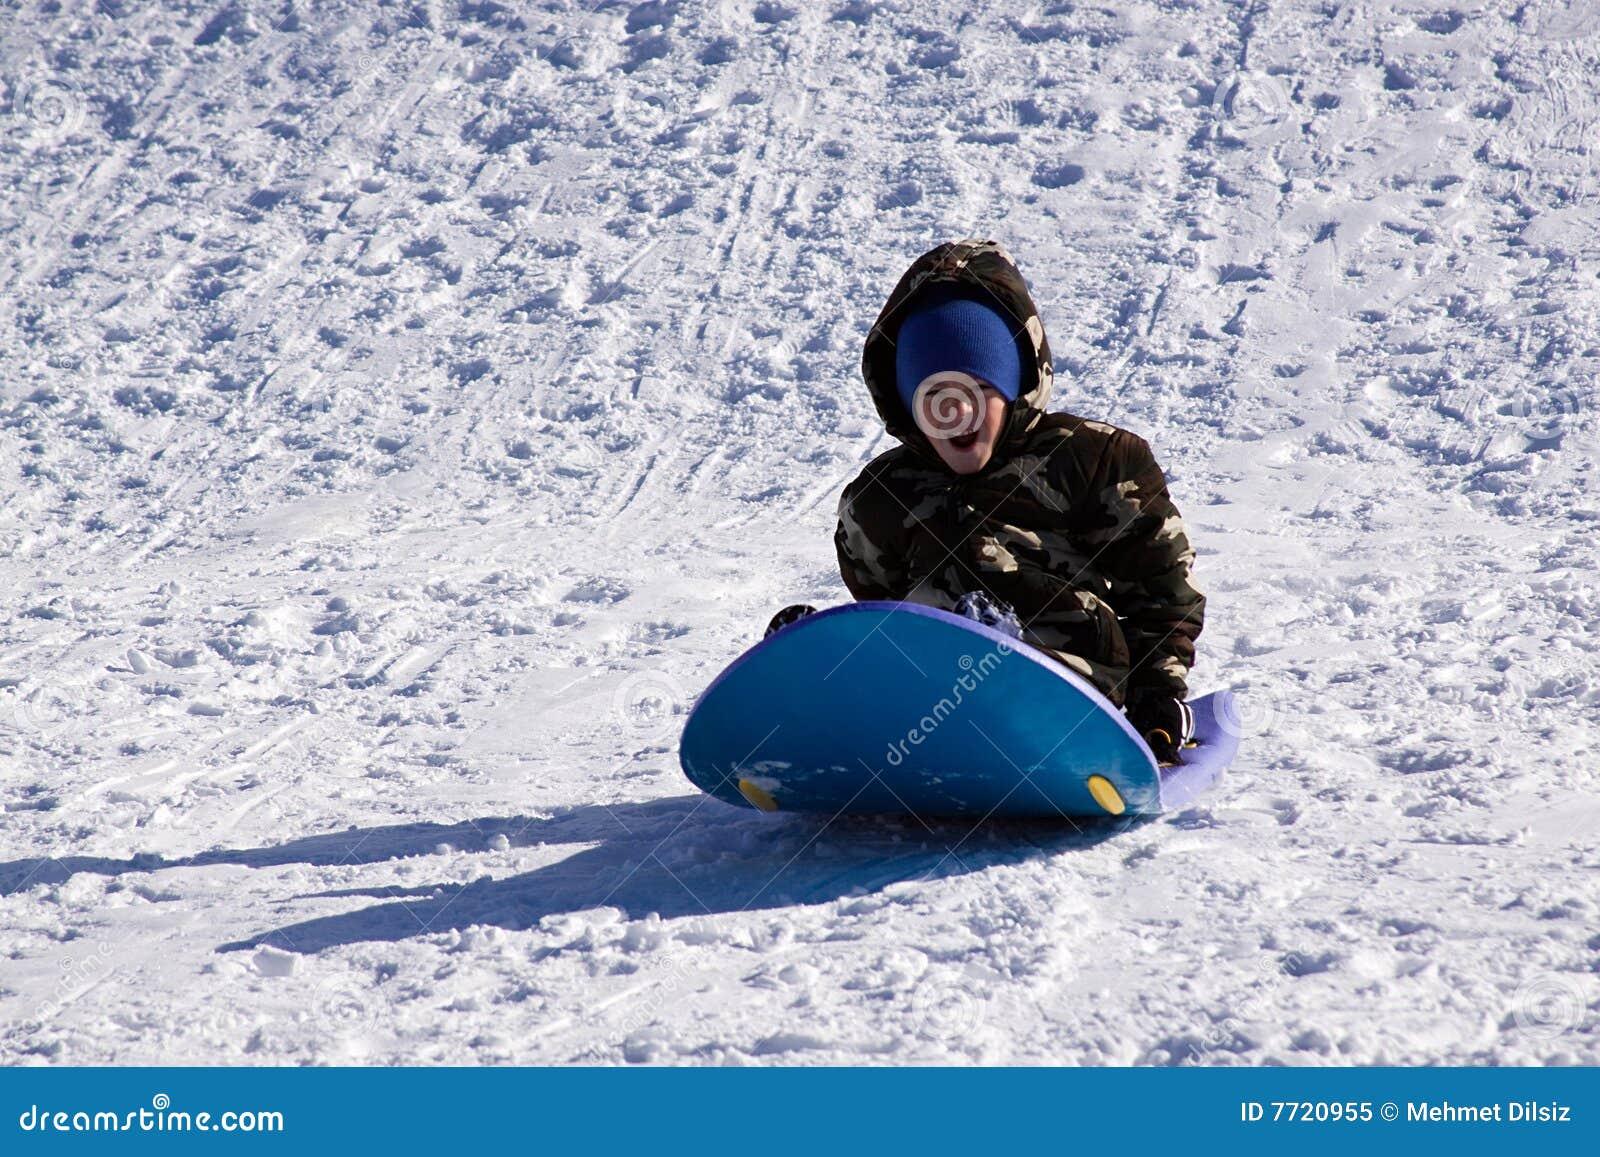 Little Boy Sledding Down The Hill Royalty Free Stock Photo